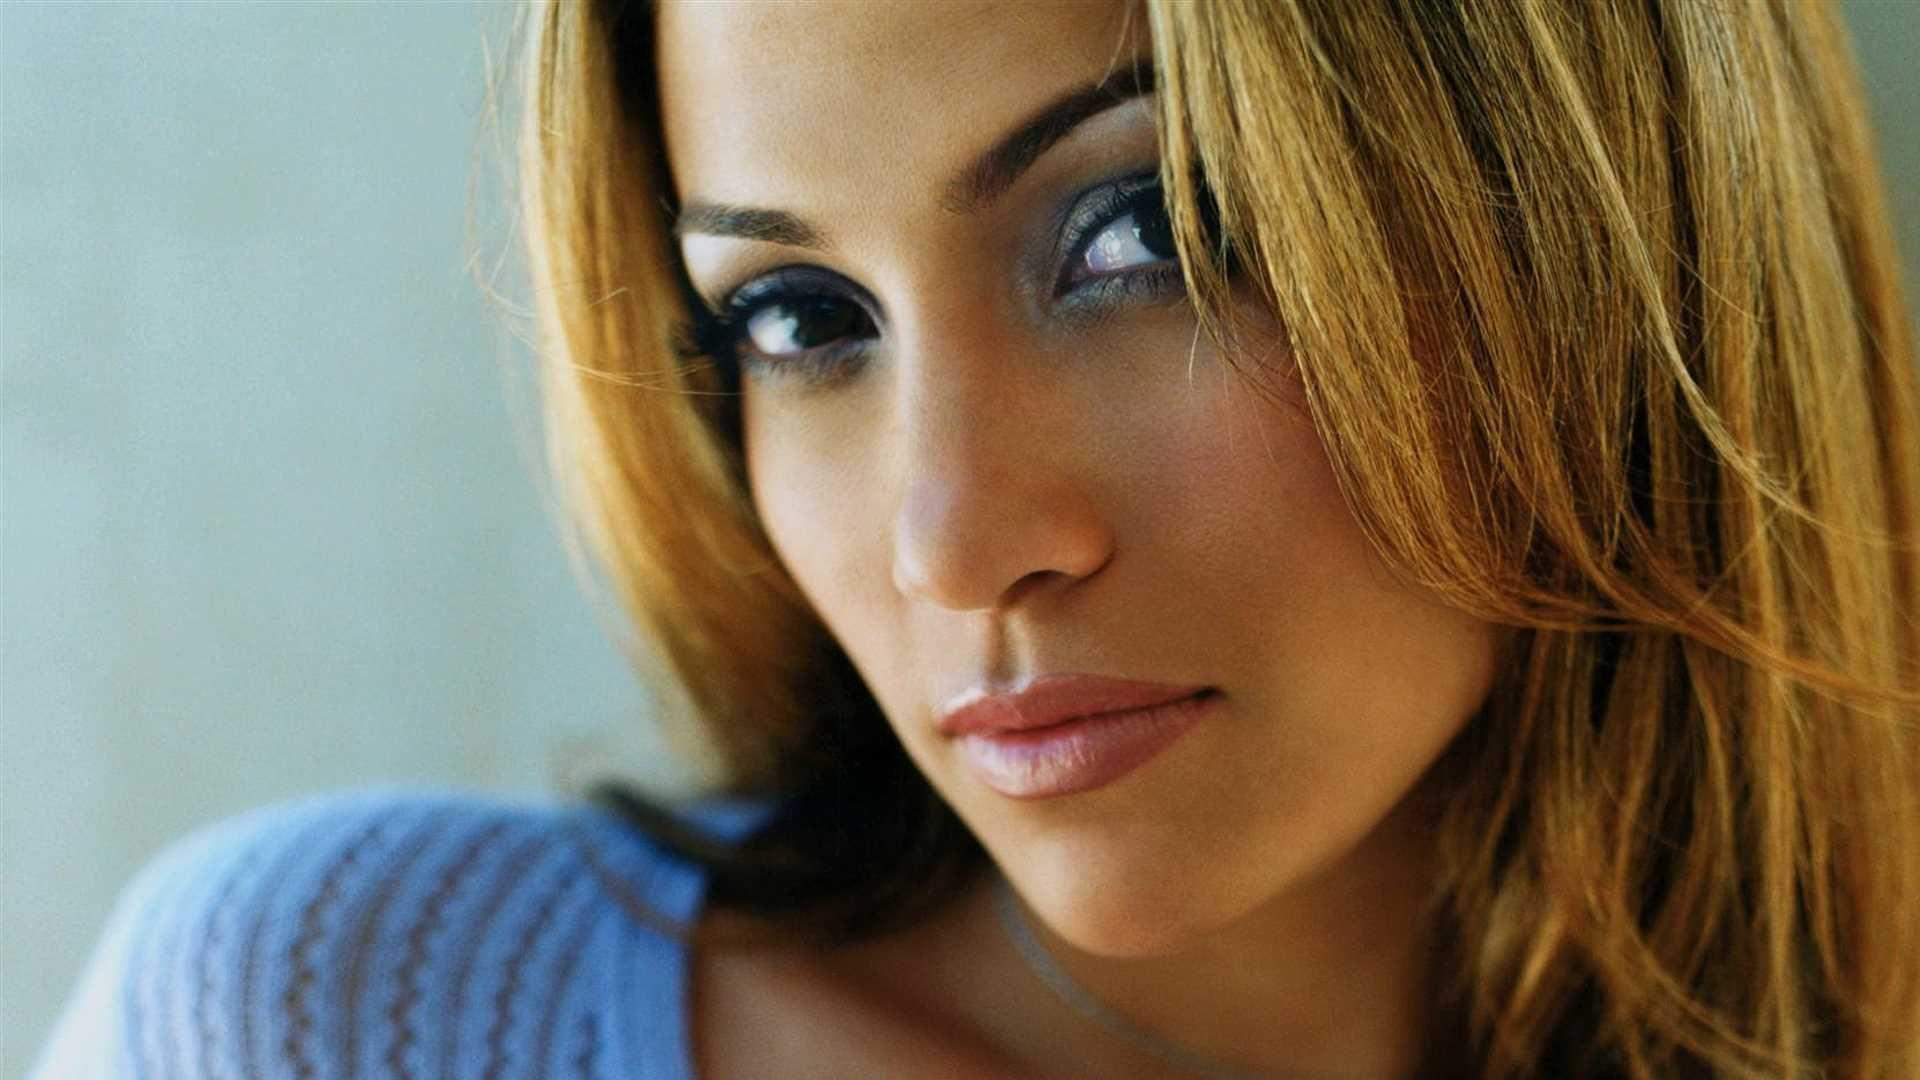 Jennifer-Lopez-Wallpaper-hd-2012